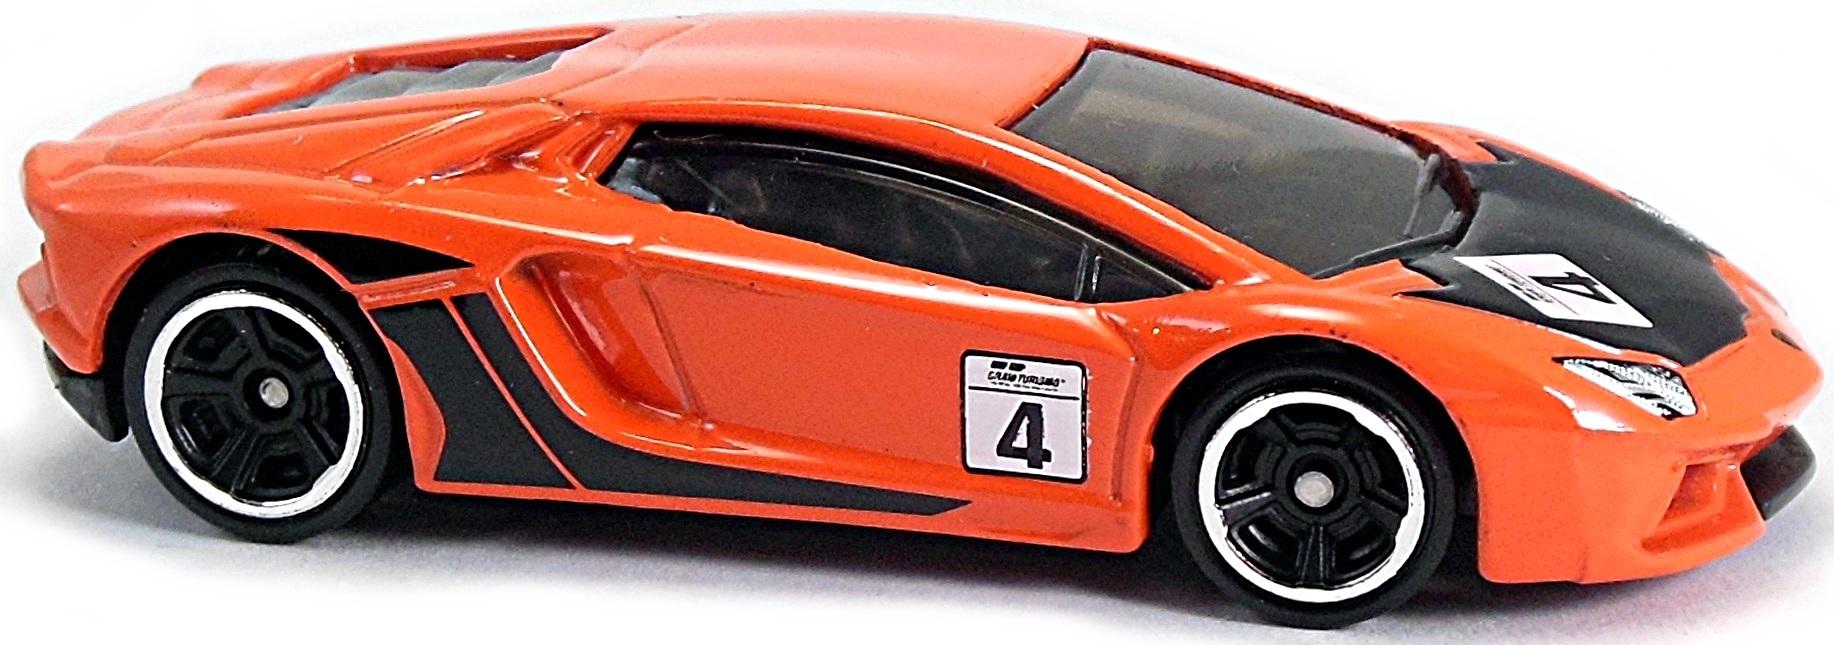 '12 Lamborghini Aventador LP 700-4 – 75mm – 2012